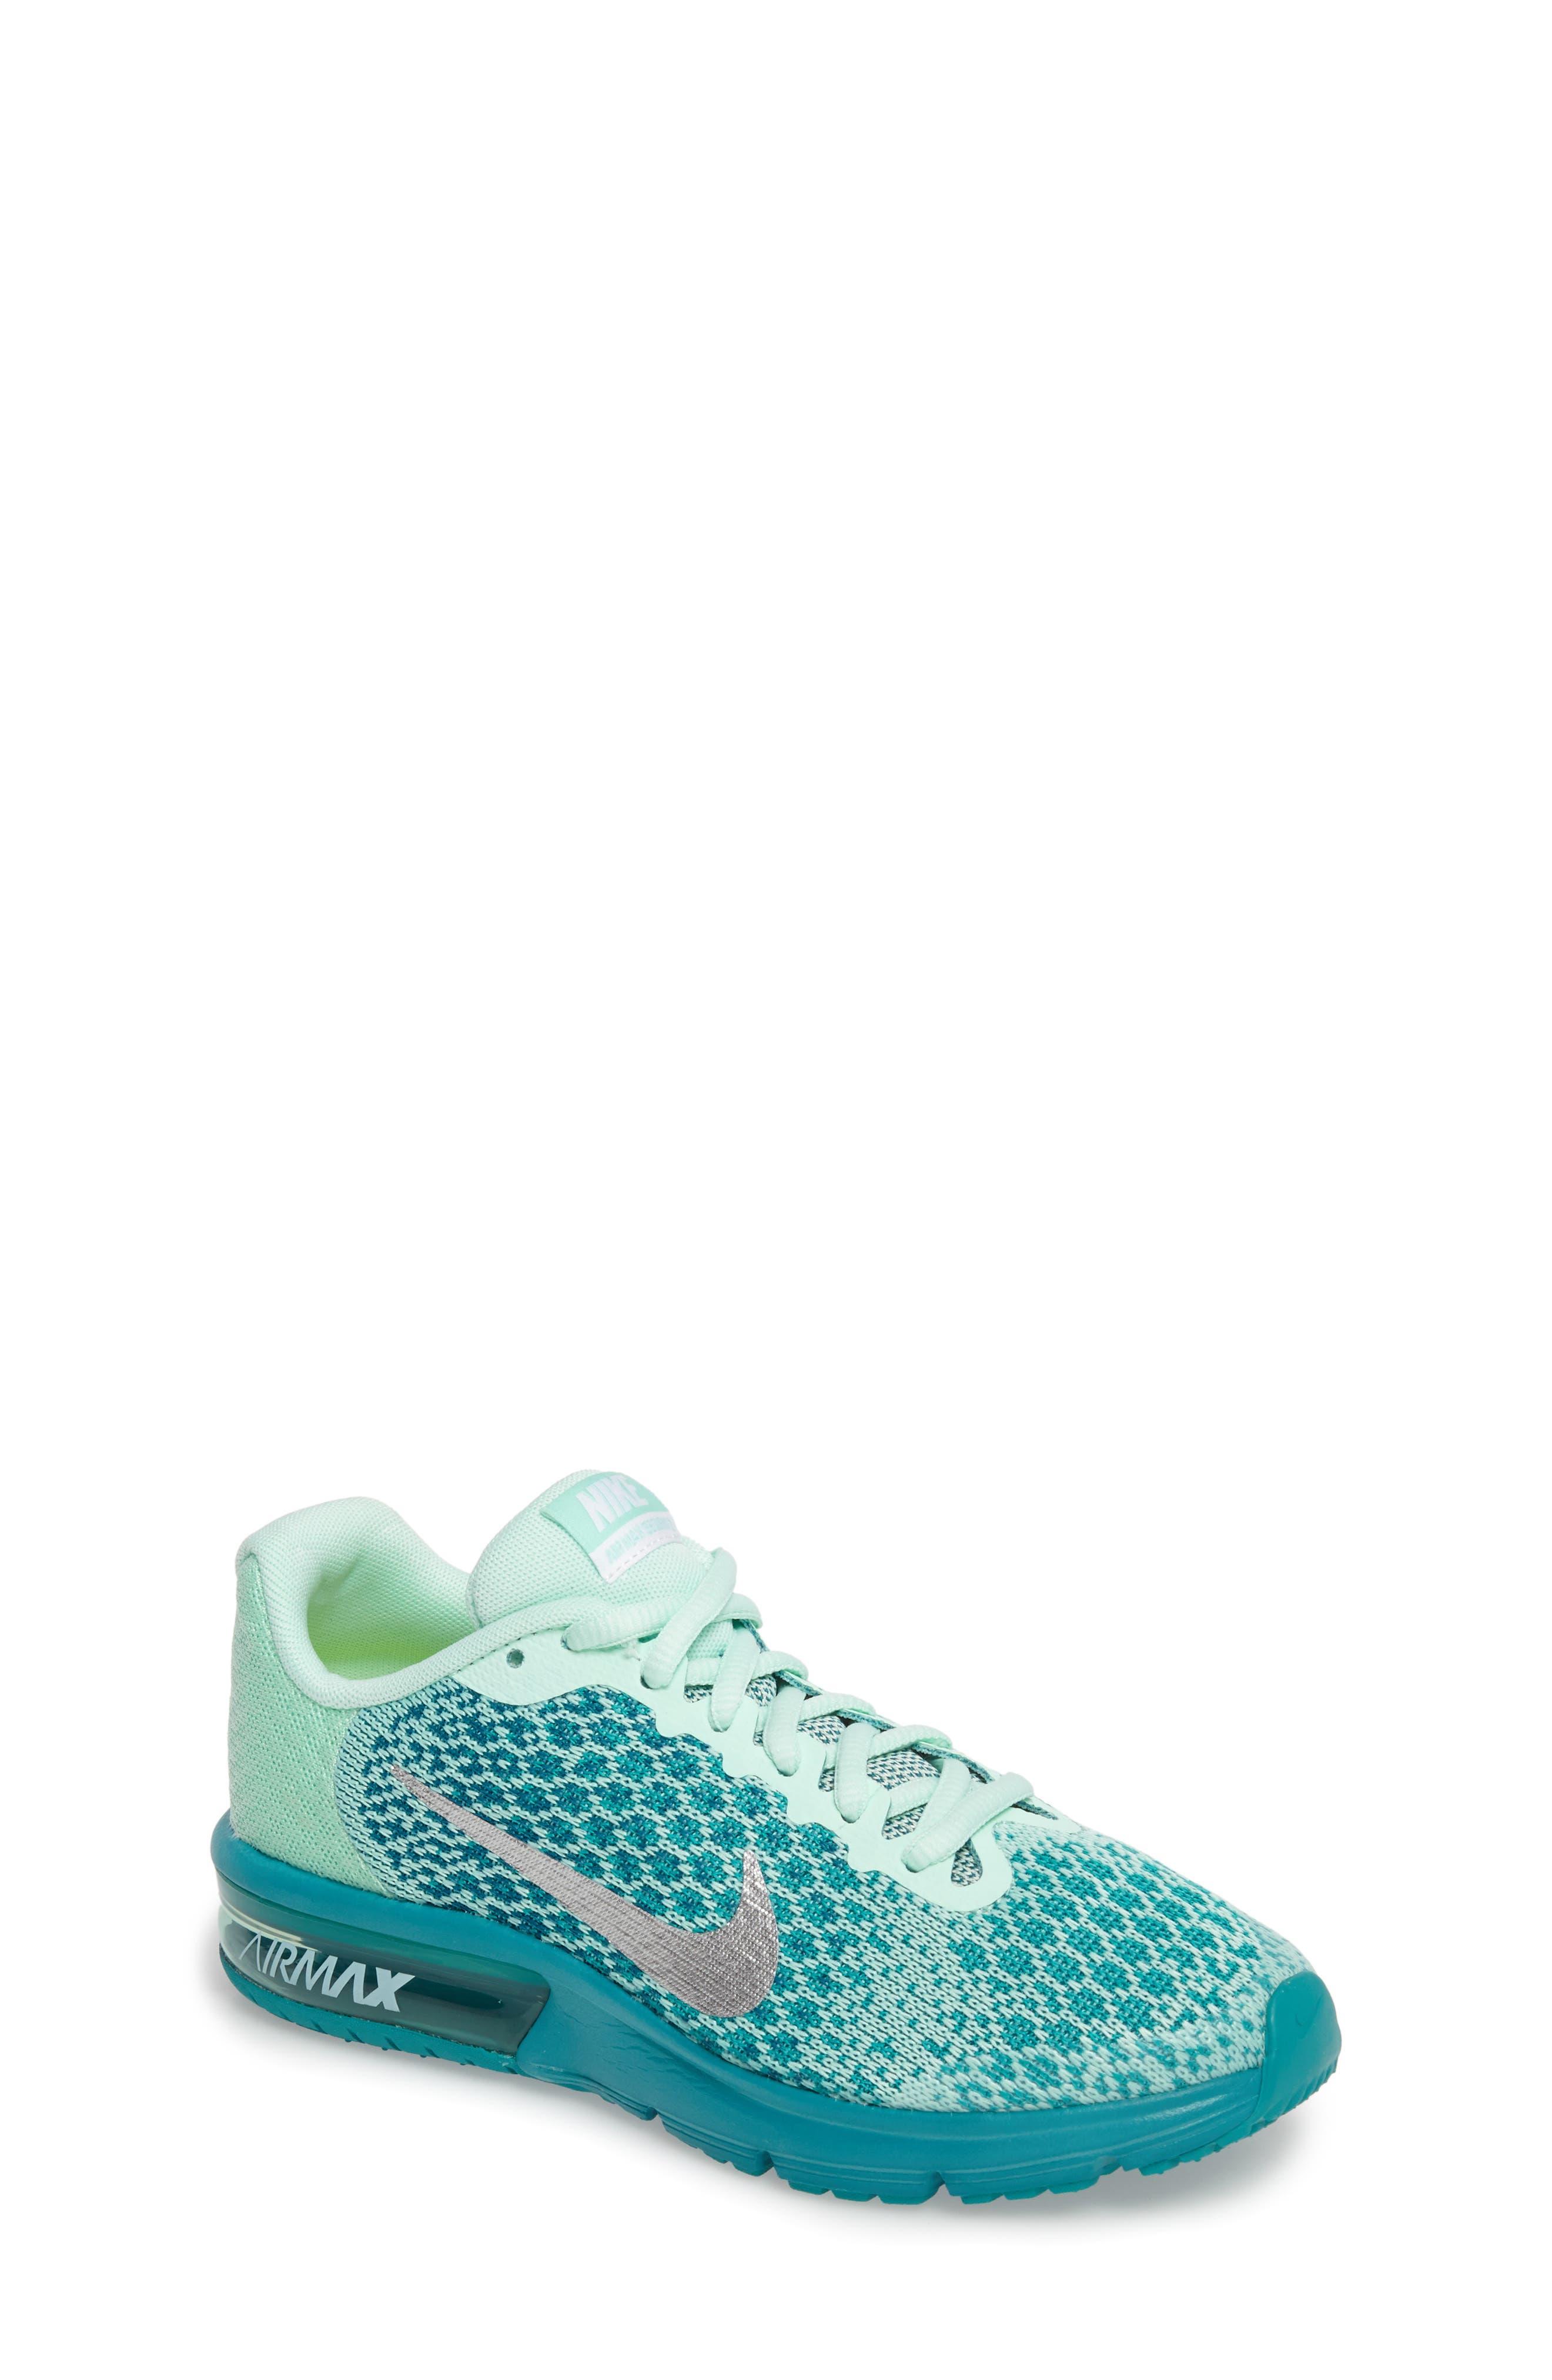 Main Image - Nike Air Max Sequent 2 Sneaker (Big Kid)